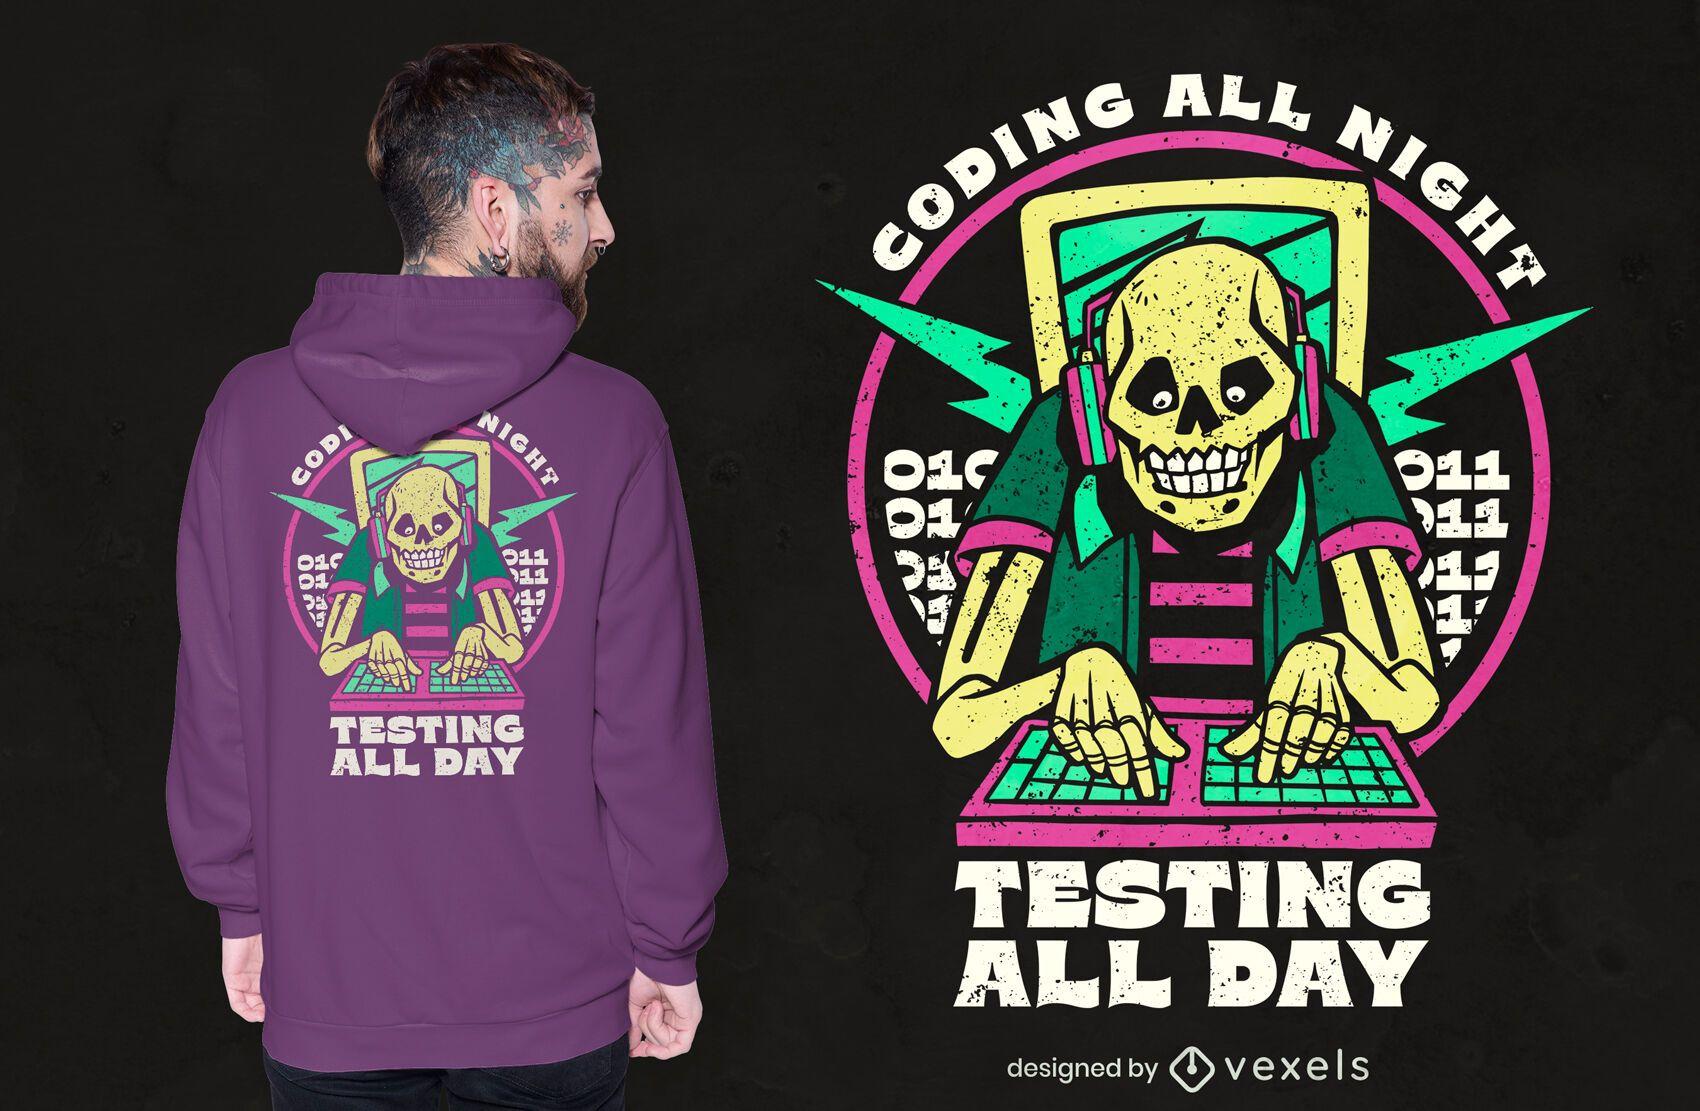 Coding skeleton t-shirt design